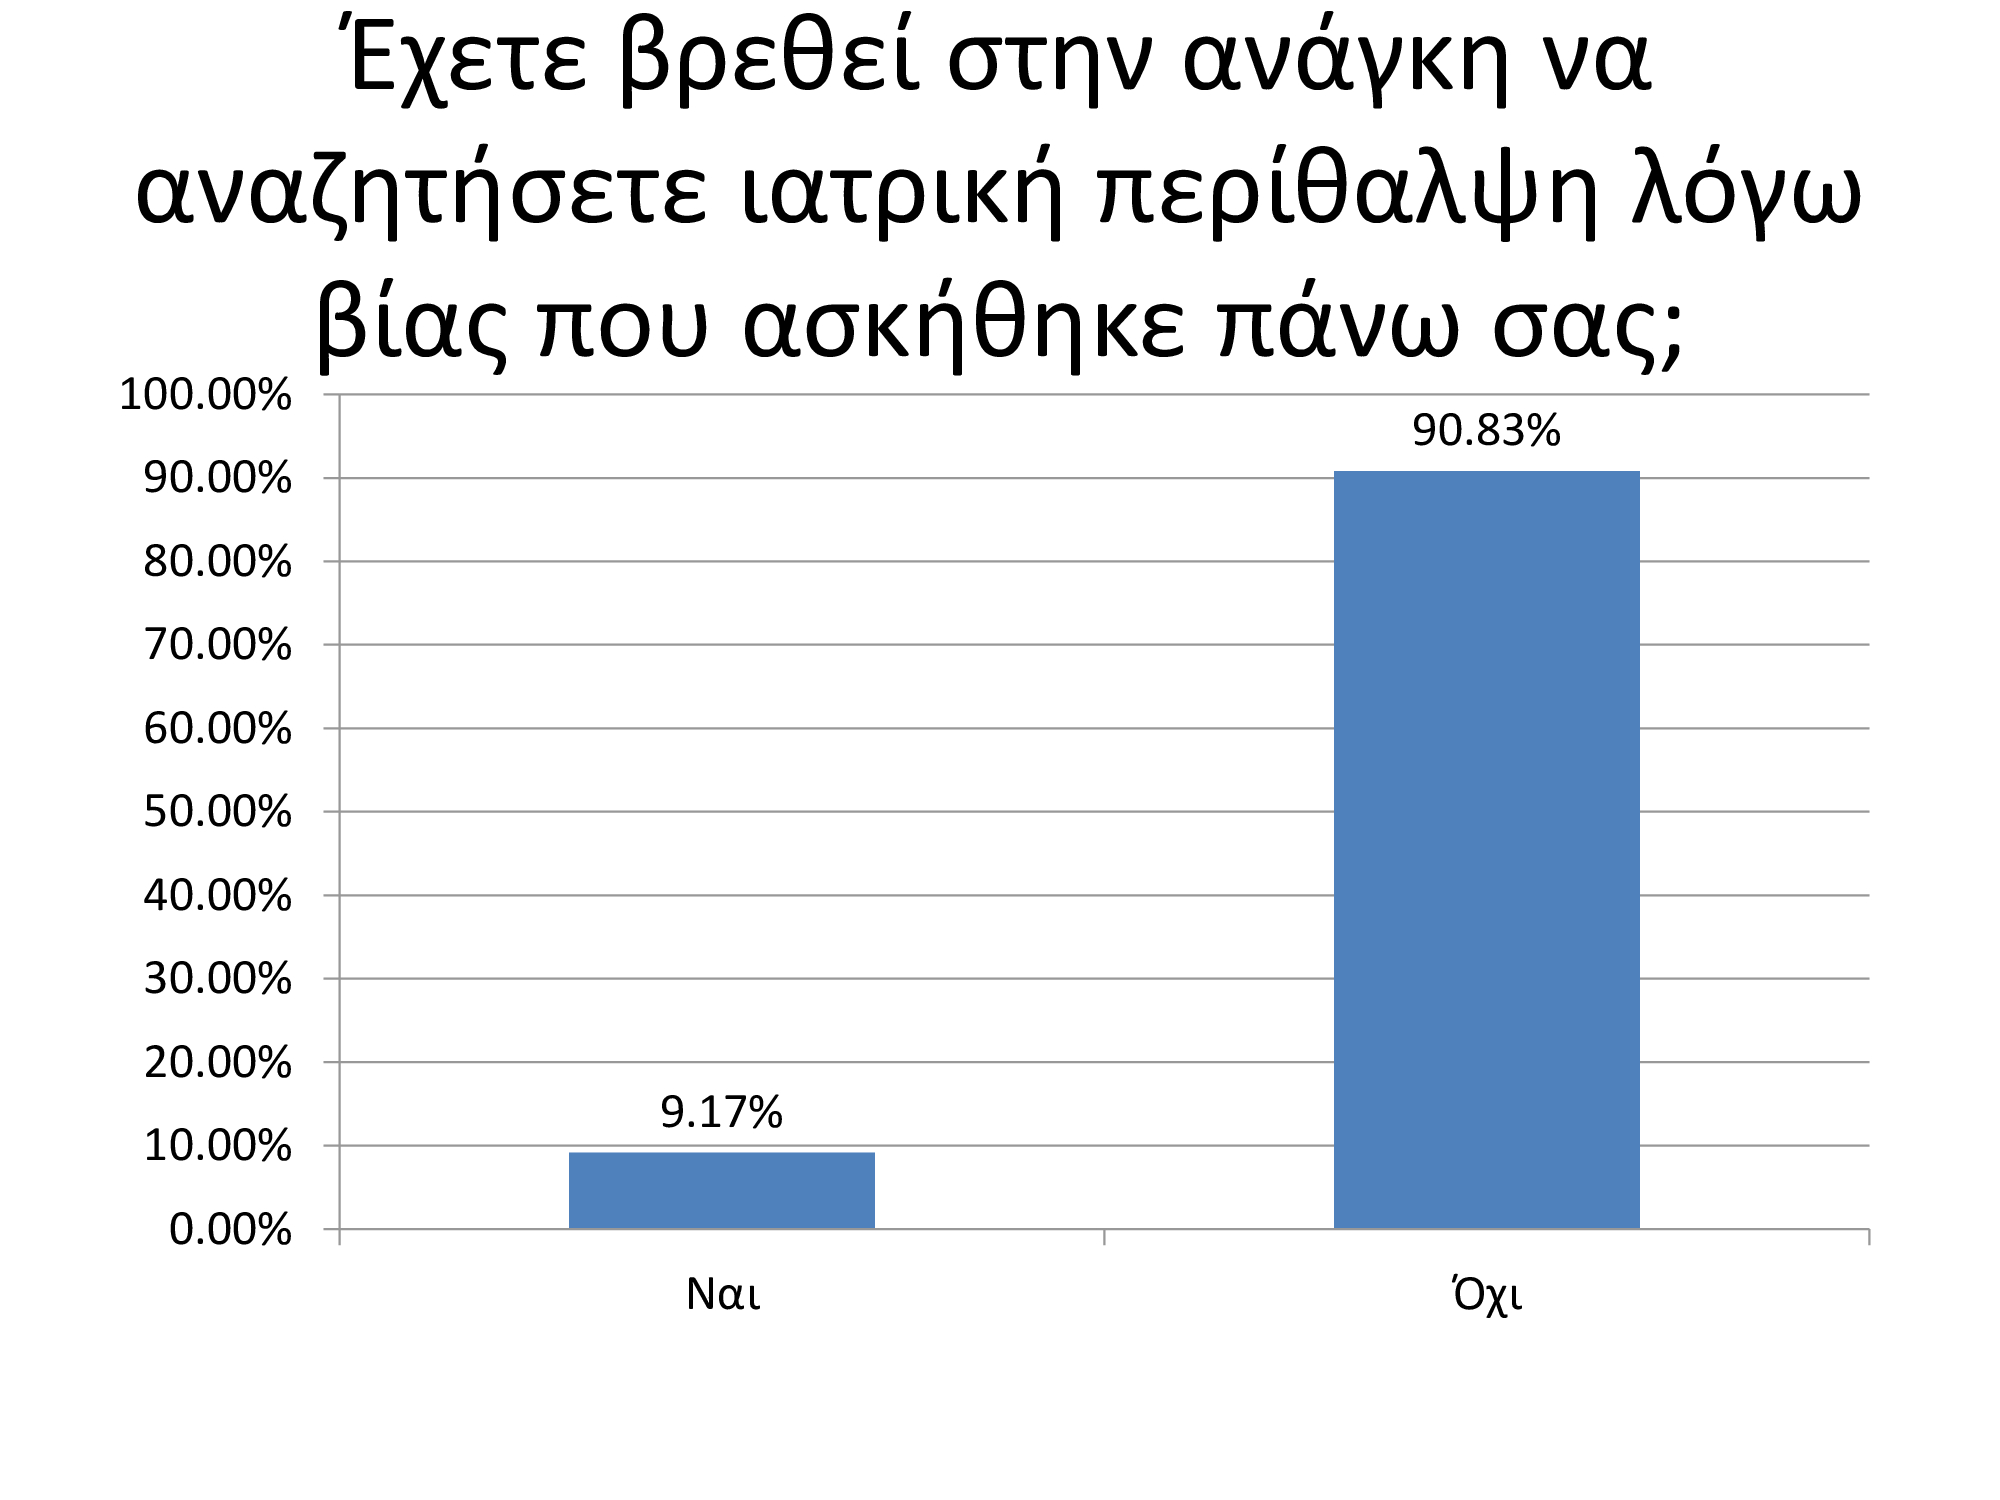 %ce%ad%cf%81%ce%b5%cf%85%ce%bd%ce%b1-%ce%b3%cf%81%ce%bf%ce%b8%ce%b9%ce%ac-%cf%84%ce%bf%cf%85-%ce%b1%ce%bd%ce%b4%cf%81%ce%bf%ce%bb%ce%bf%ce%b3%ce%b9%ce%ba%ce%bf%cf%8d-%ce%b9%ce%bd%cf%83%cf%84%ce%b97